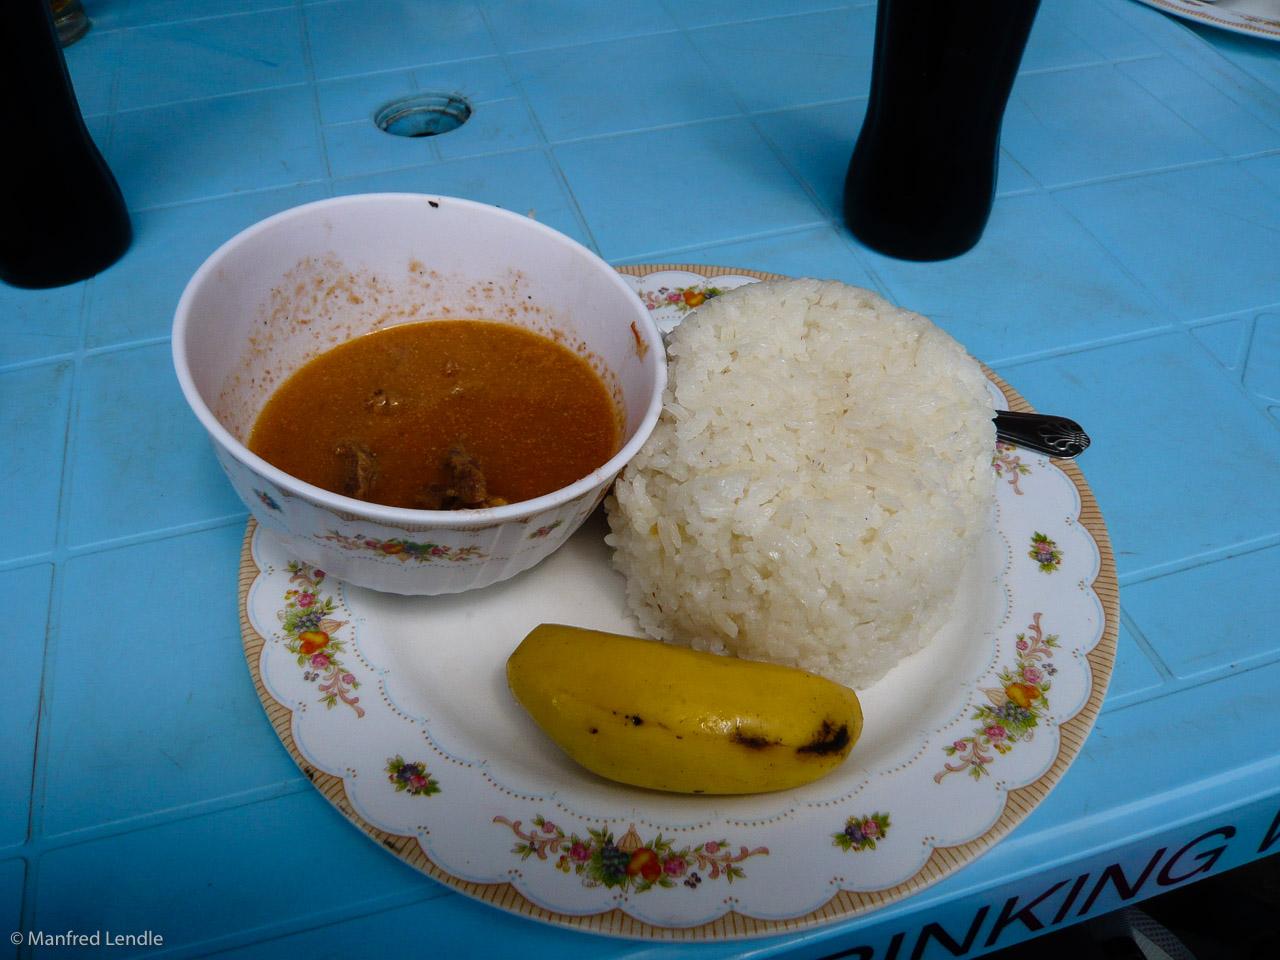 Tansania_2009-1050864.jpg